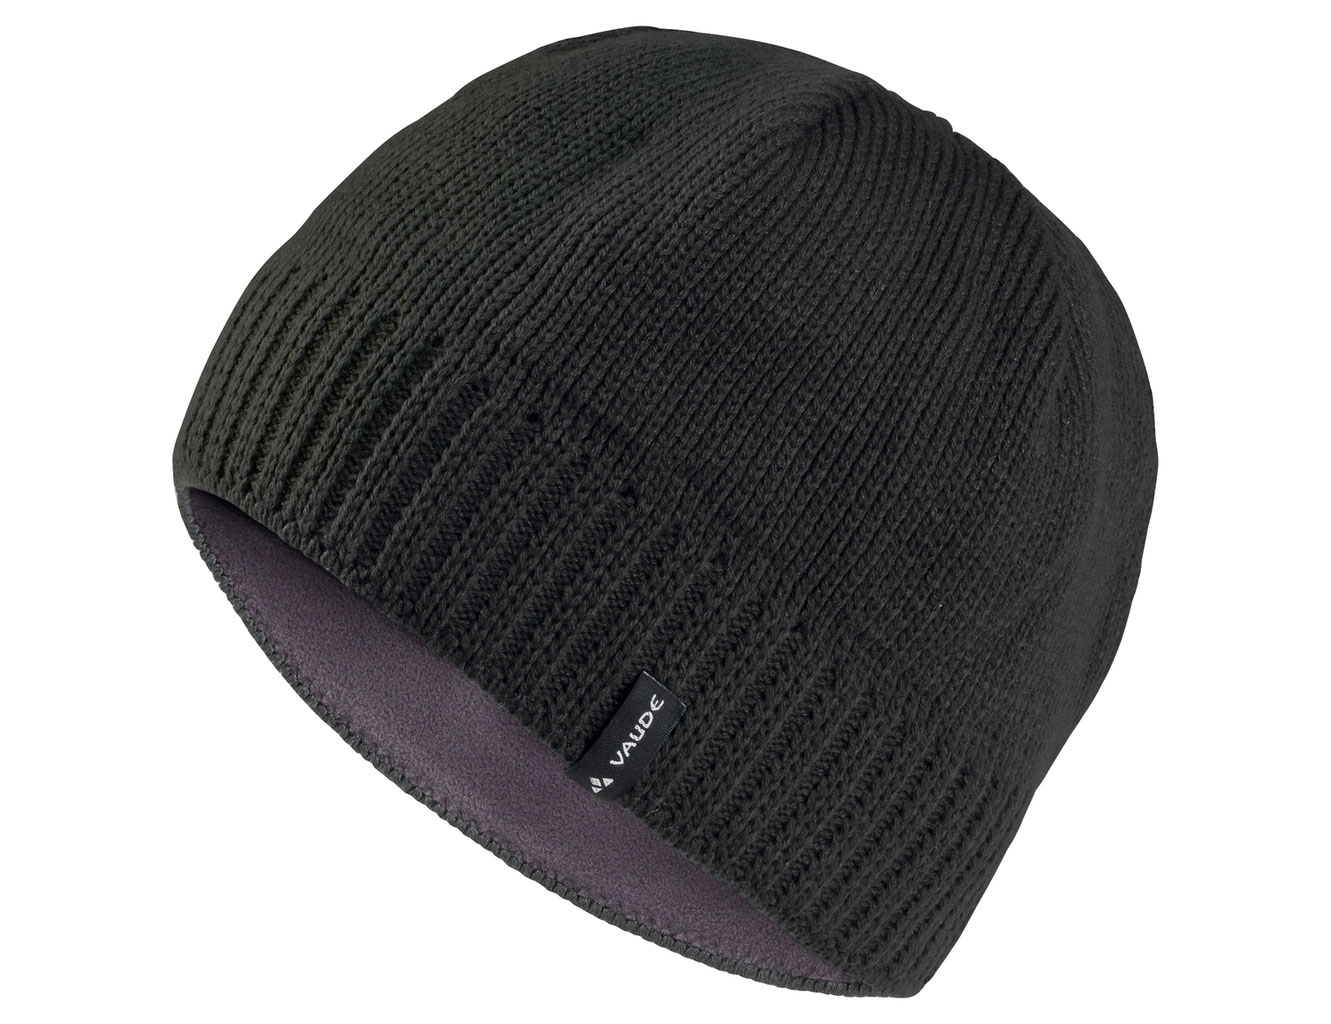 Eisbär Skater OS Mütze grau